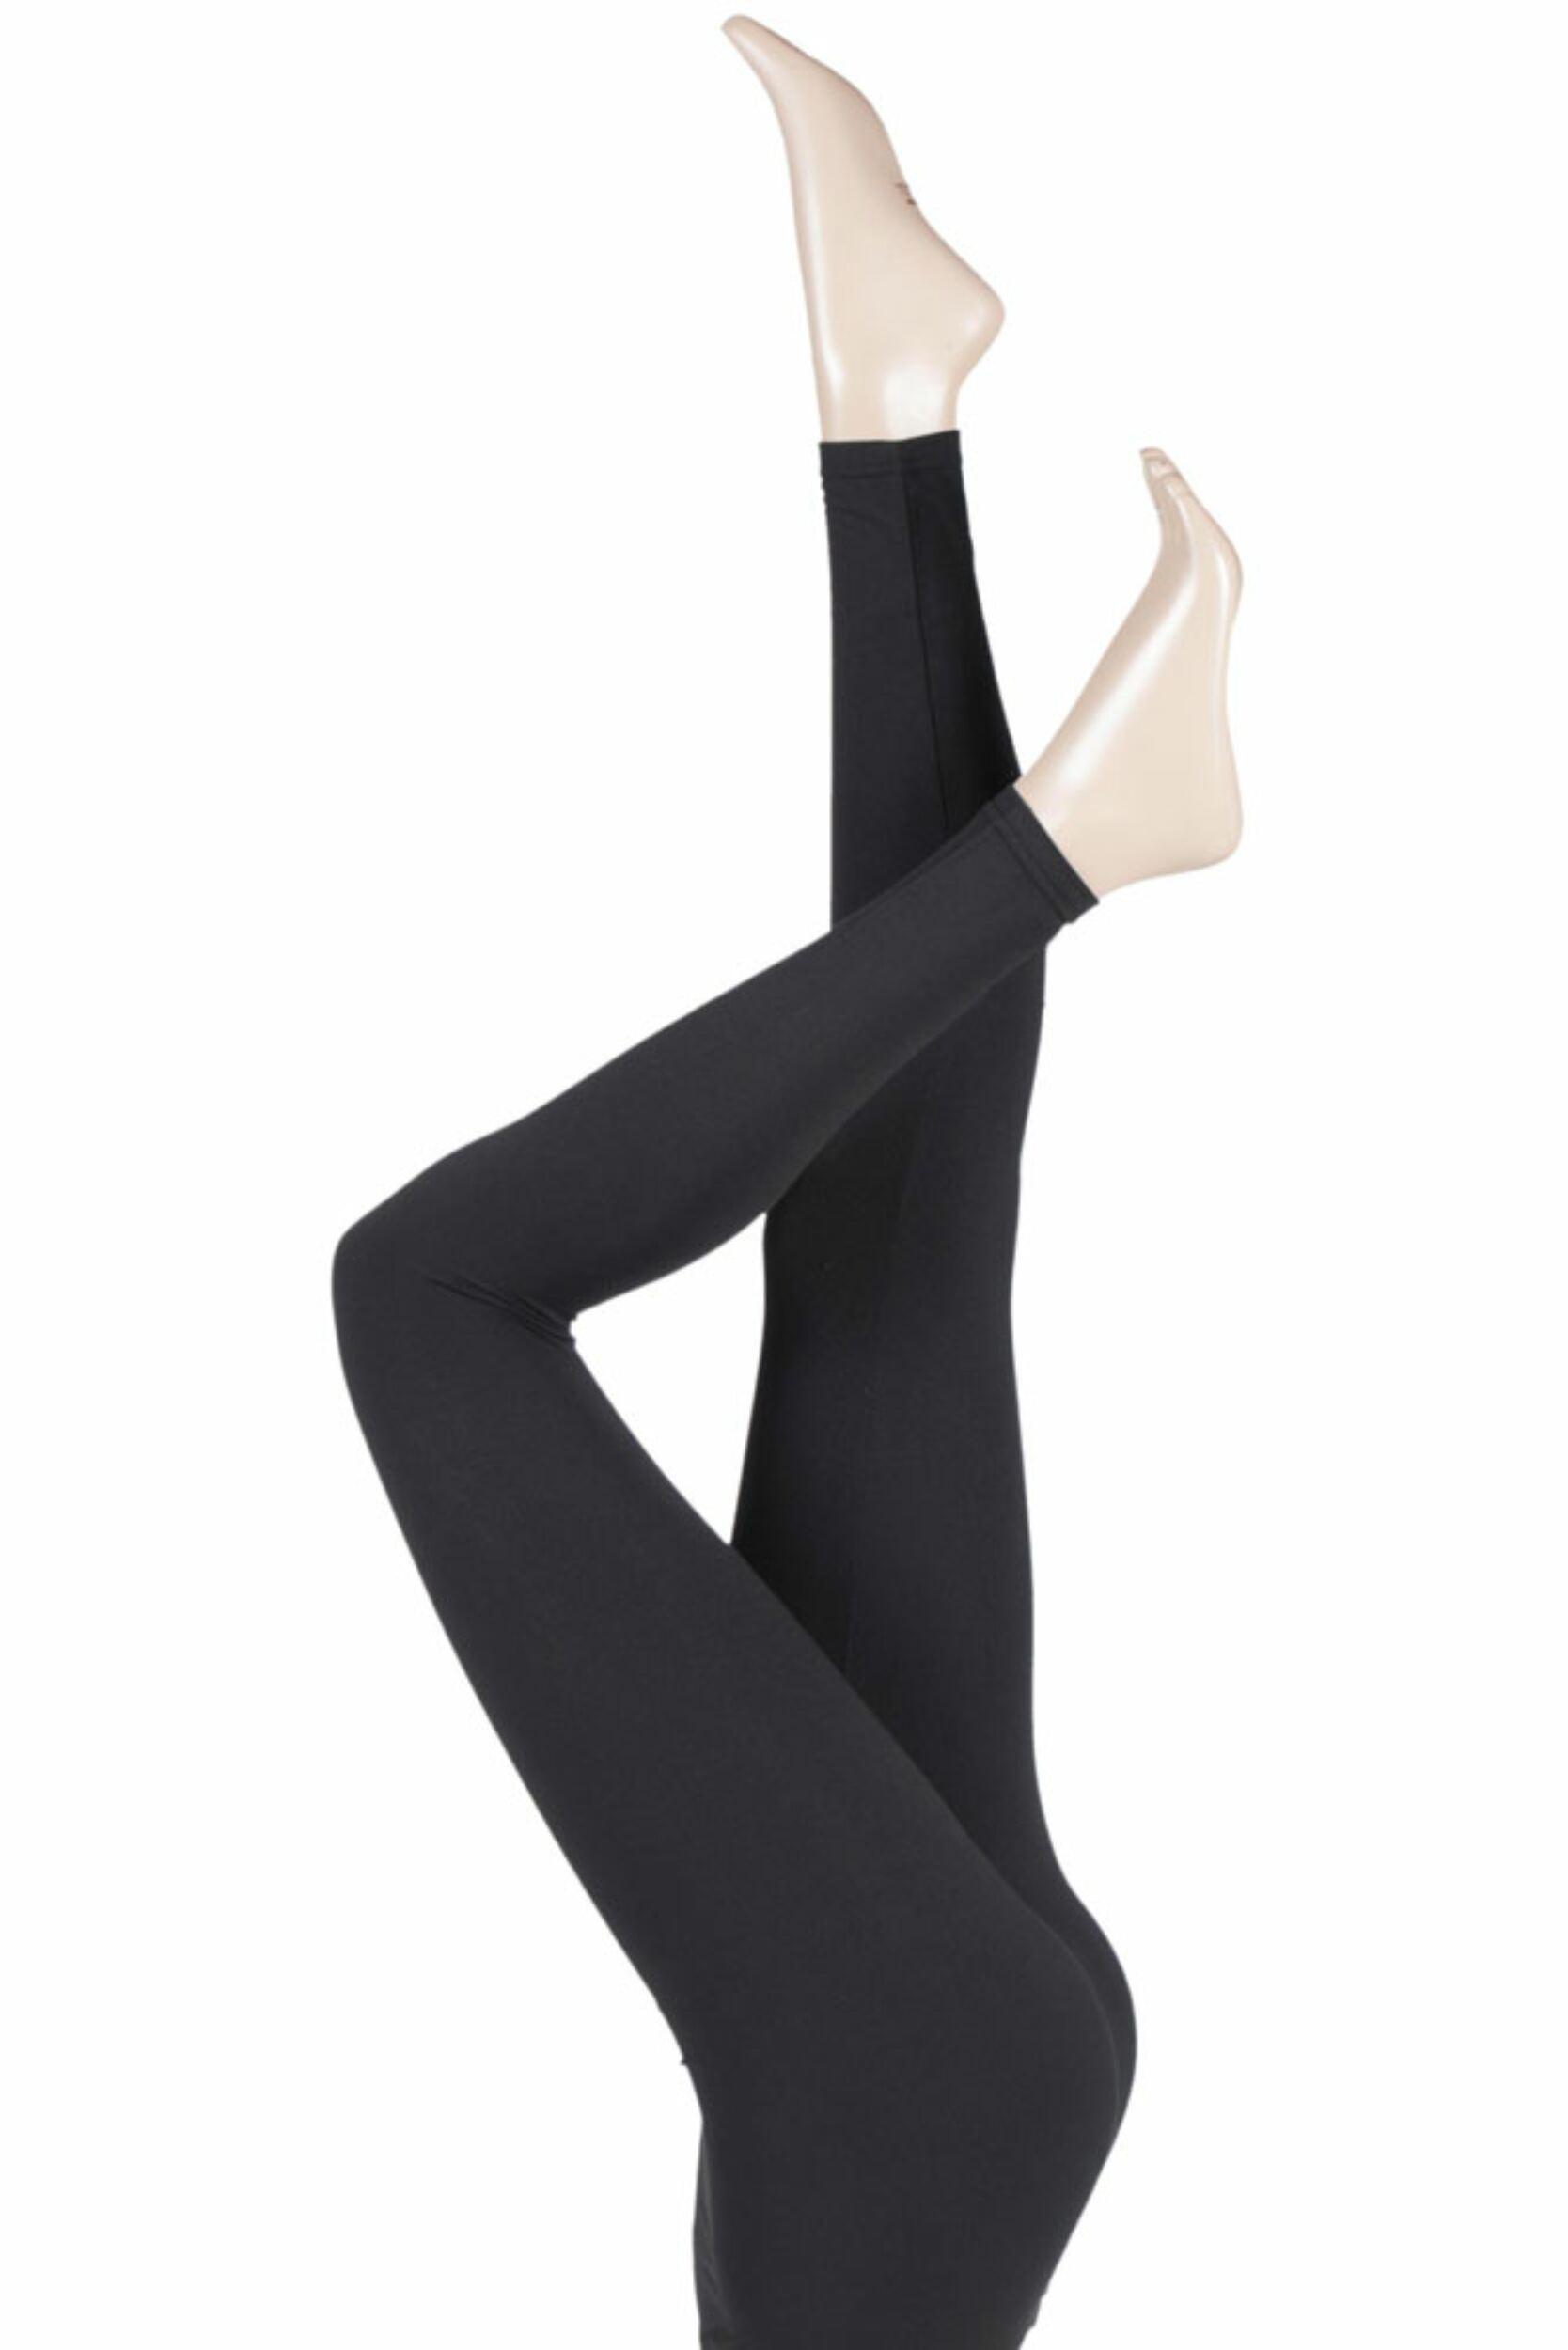 1 Pair Silky Plain Everyday Leggings